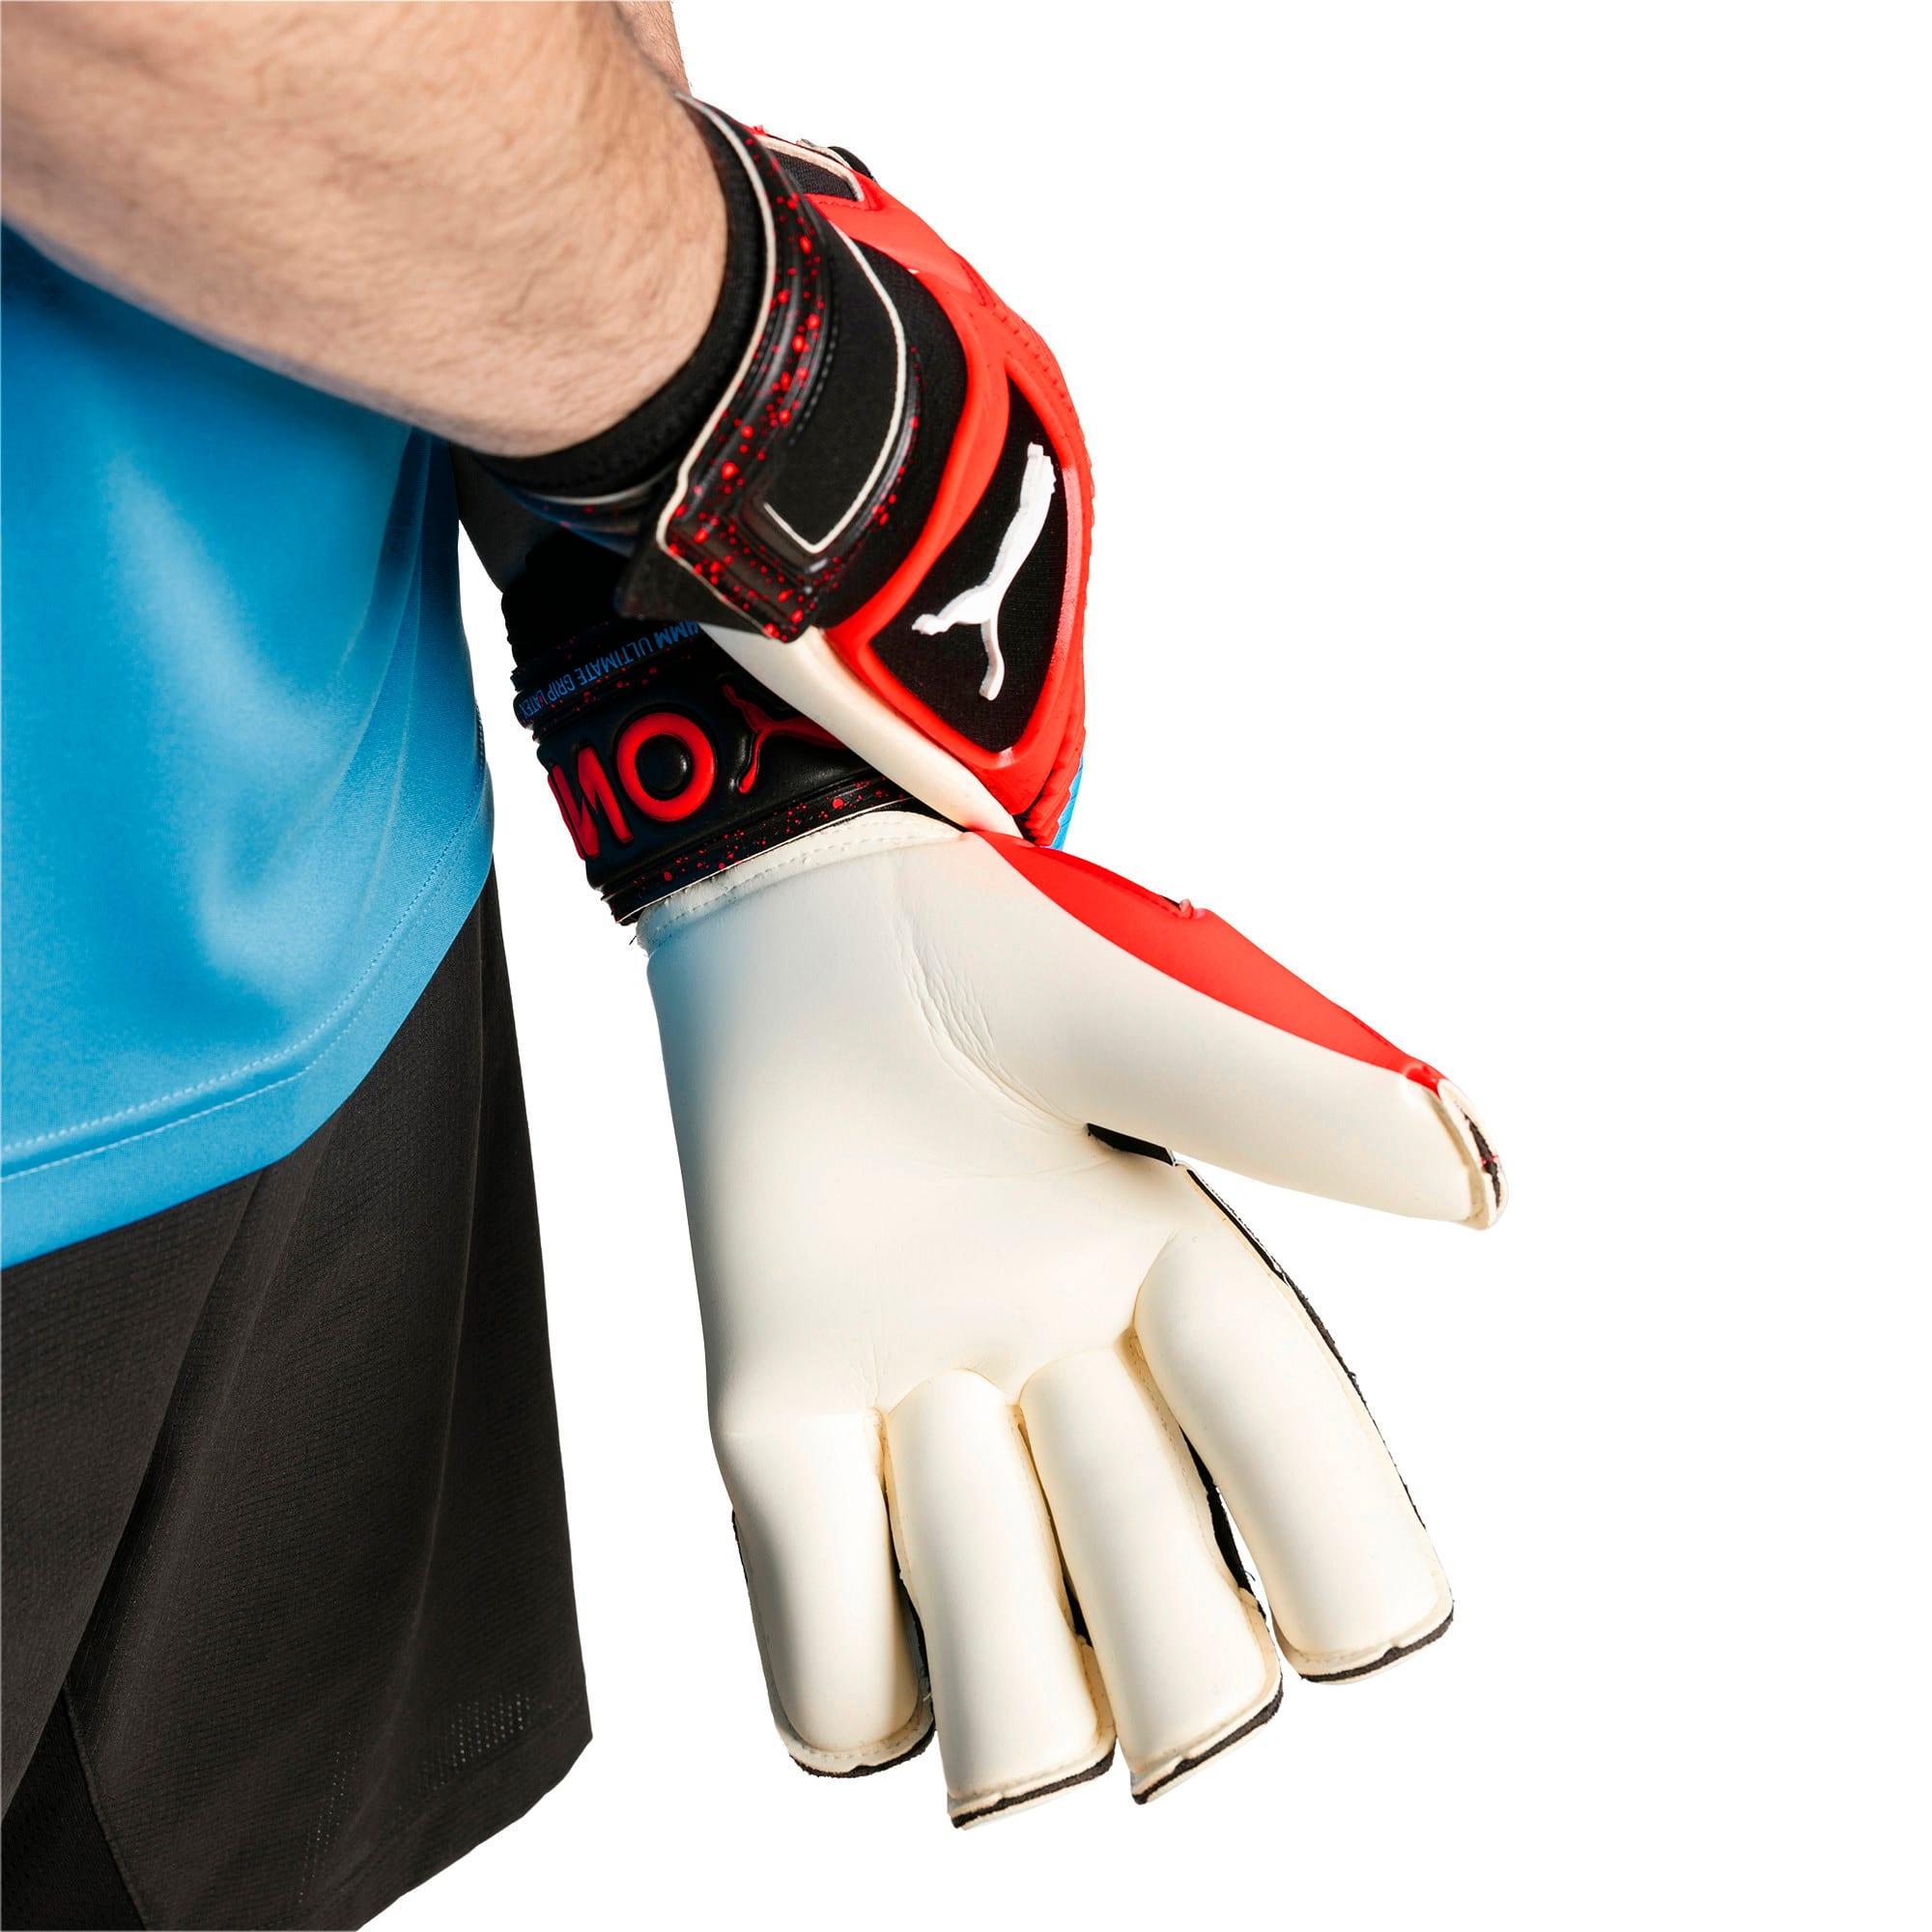 Thumbnail 3 of PUMA ONE Grip 1 Hybrid Pro Goalkeeper Gloves, Black-Bleu Azur-Red Blast, medium